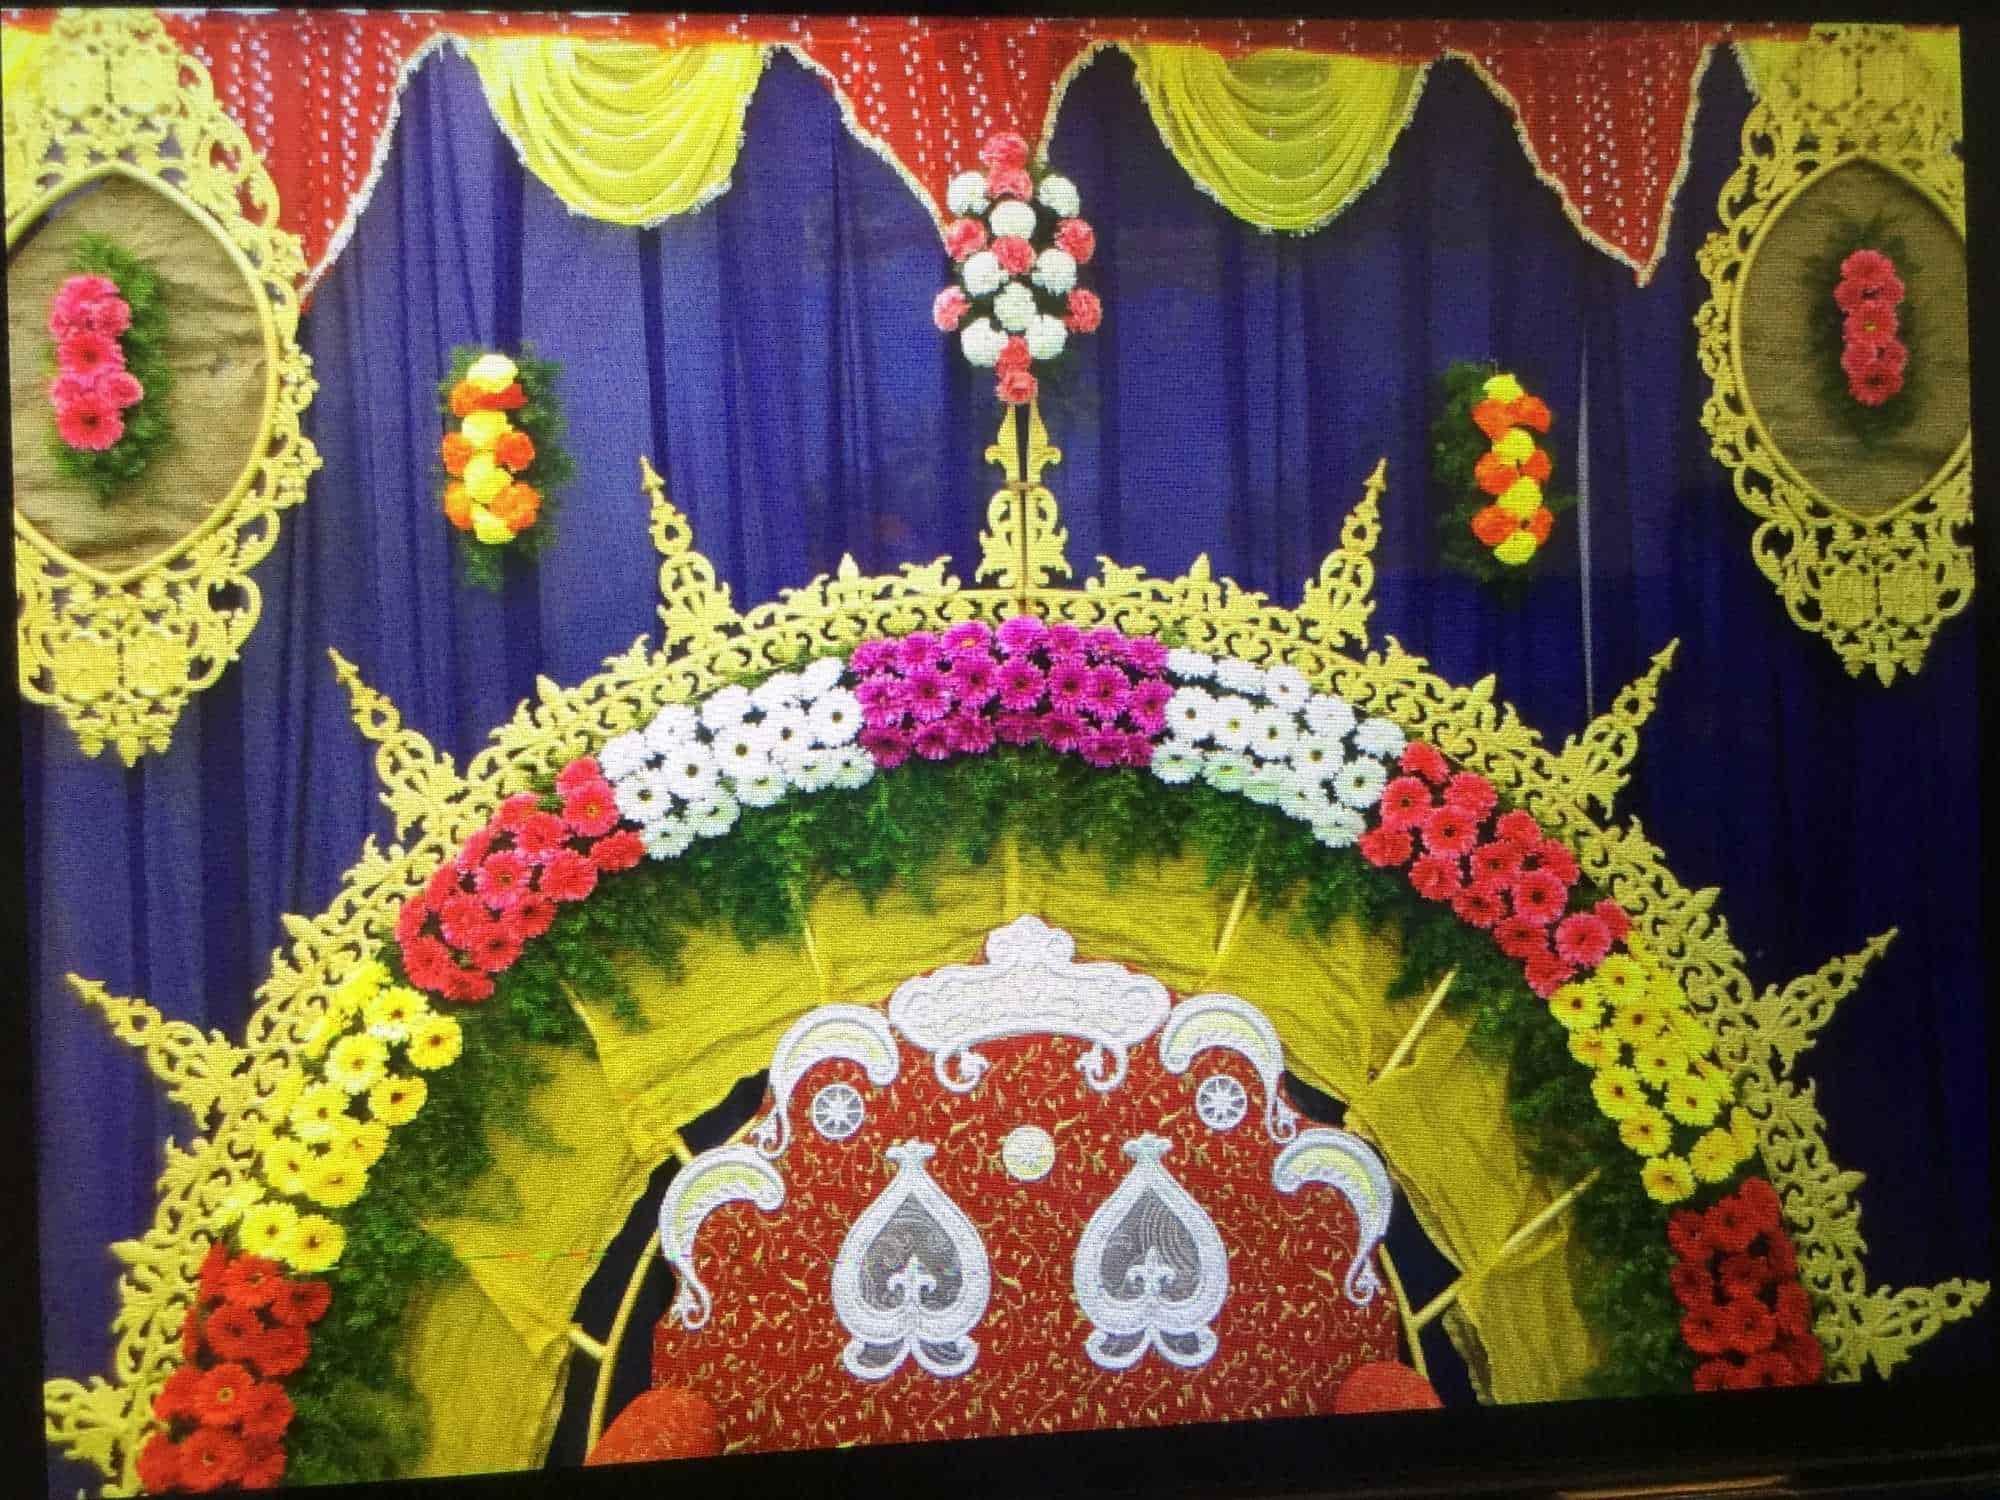 ... Satyanarayana Flower Decoration Photos, Hanamkonda, Warangal - Balloon Decorators ...